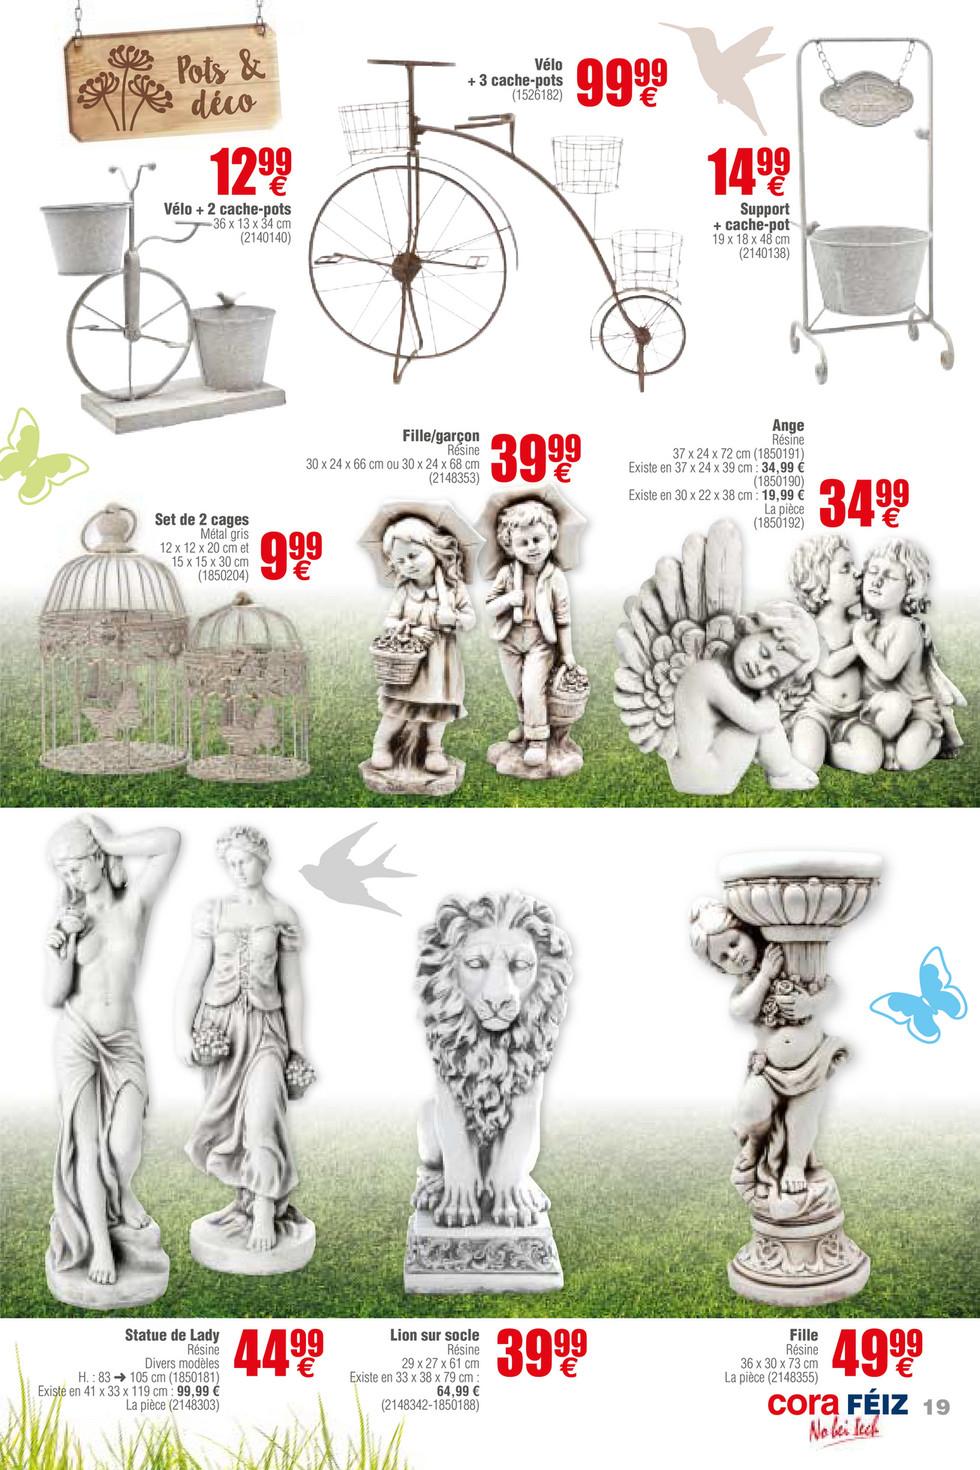 Cora - Foetz Jardin 13-03-18 - Page 18-19 concernant Velo Deco Jardin